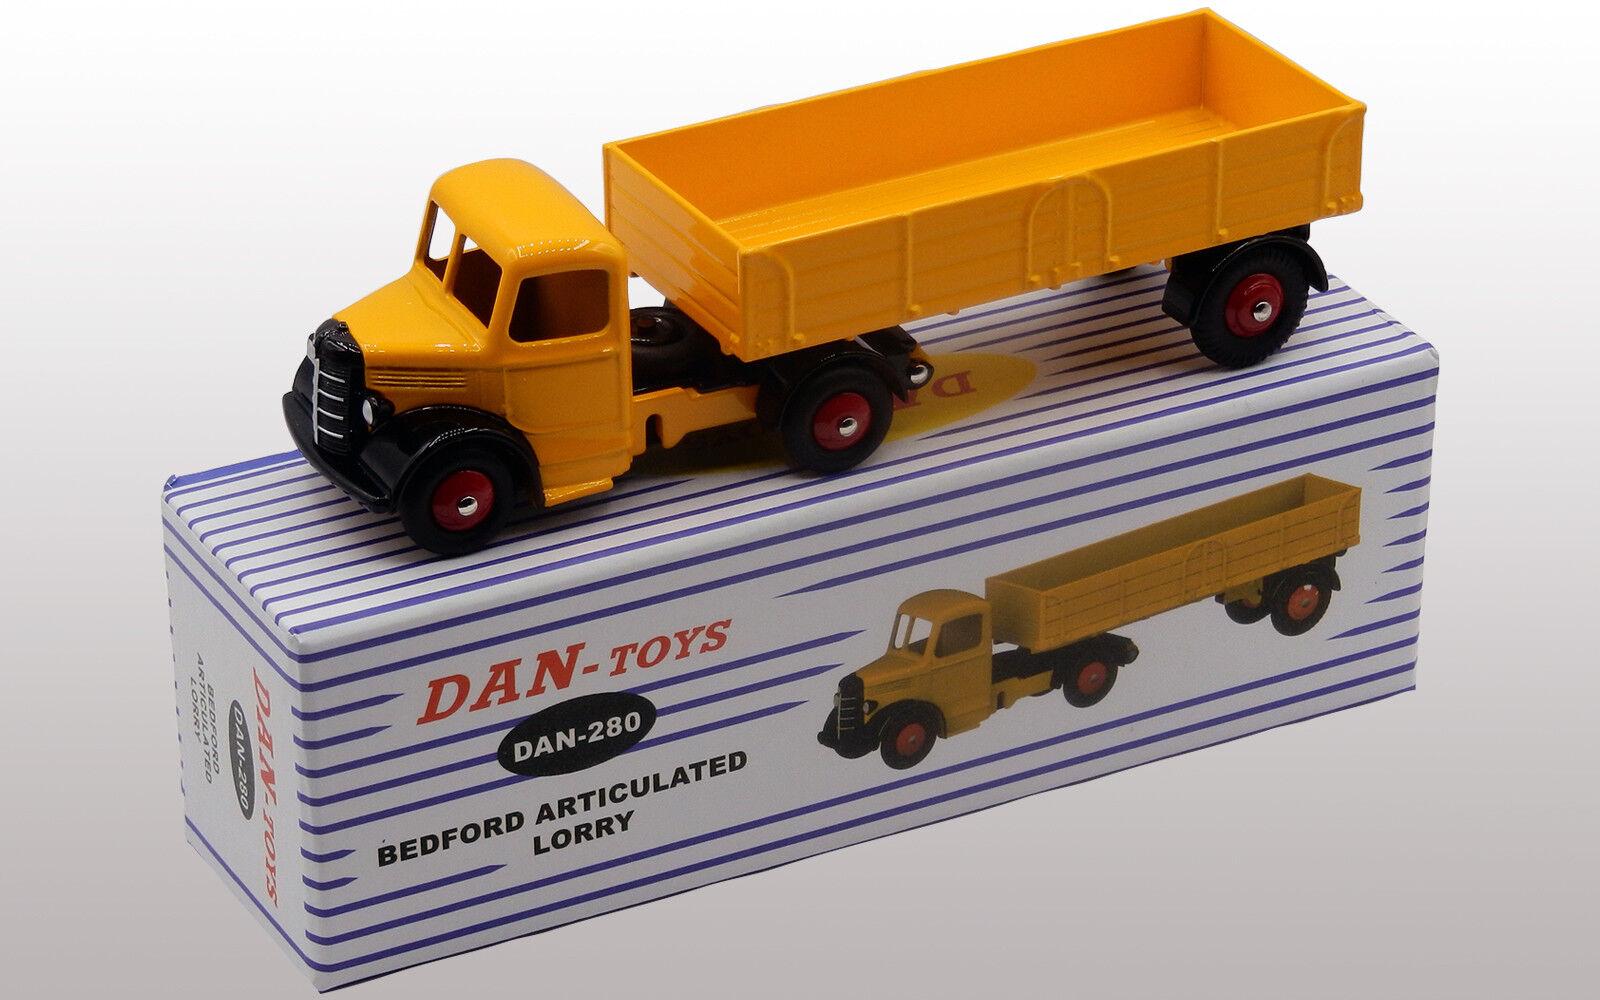 DAN TOYS Bedford Articulé Lorry Jaune Ref. DAN-280